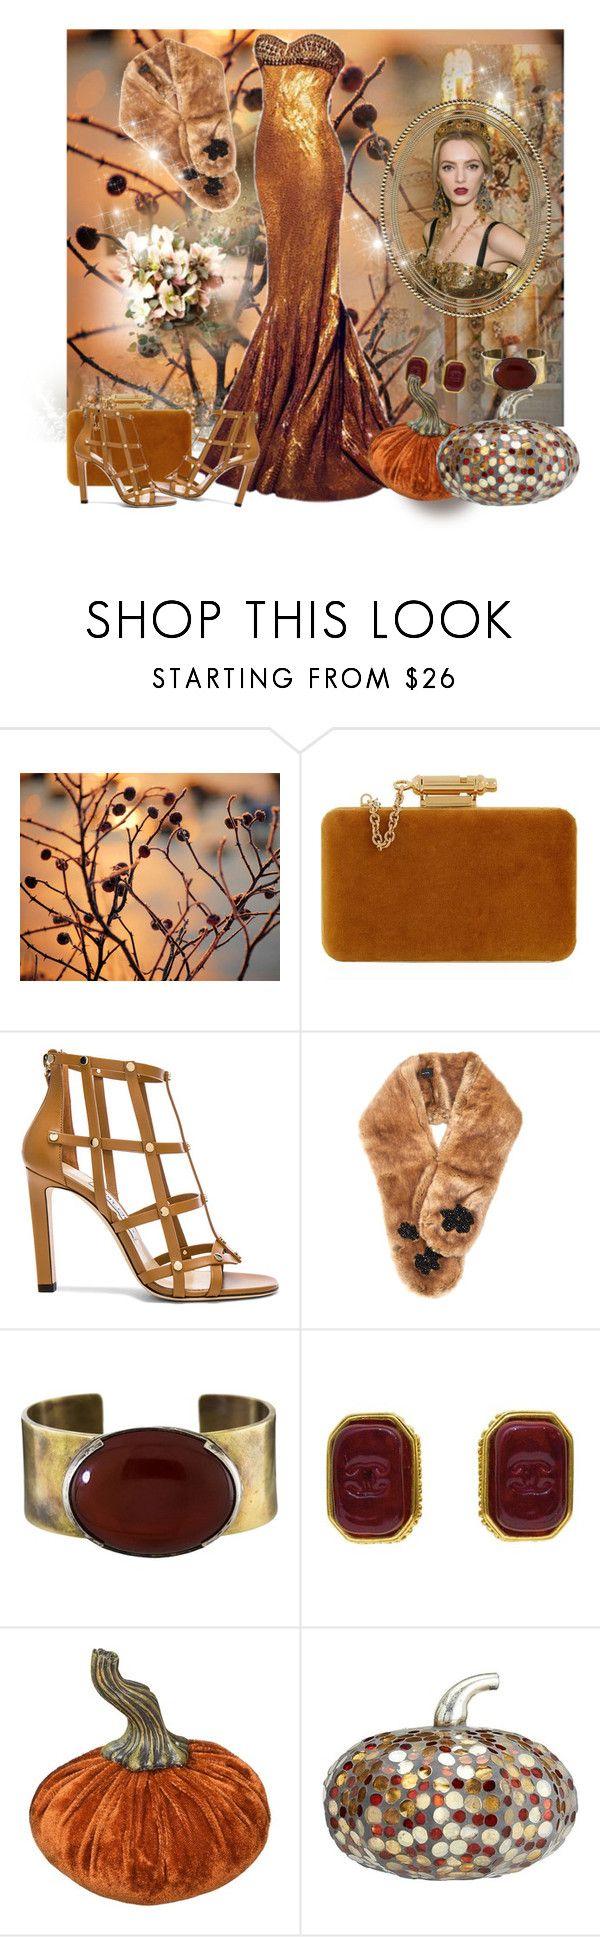 """Golden Girl"" by sherrysrosecottage-1 ❤ liked on Polyvore featuring Nicolas Jebran, Sophie Hulme, Jimmy Choo, Simone Rocha, Orduna Design, Glitzhome and Pottery Barn"